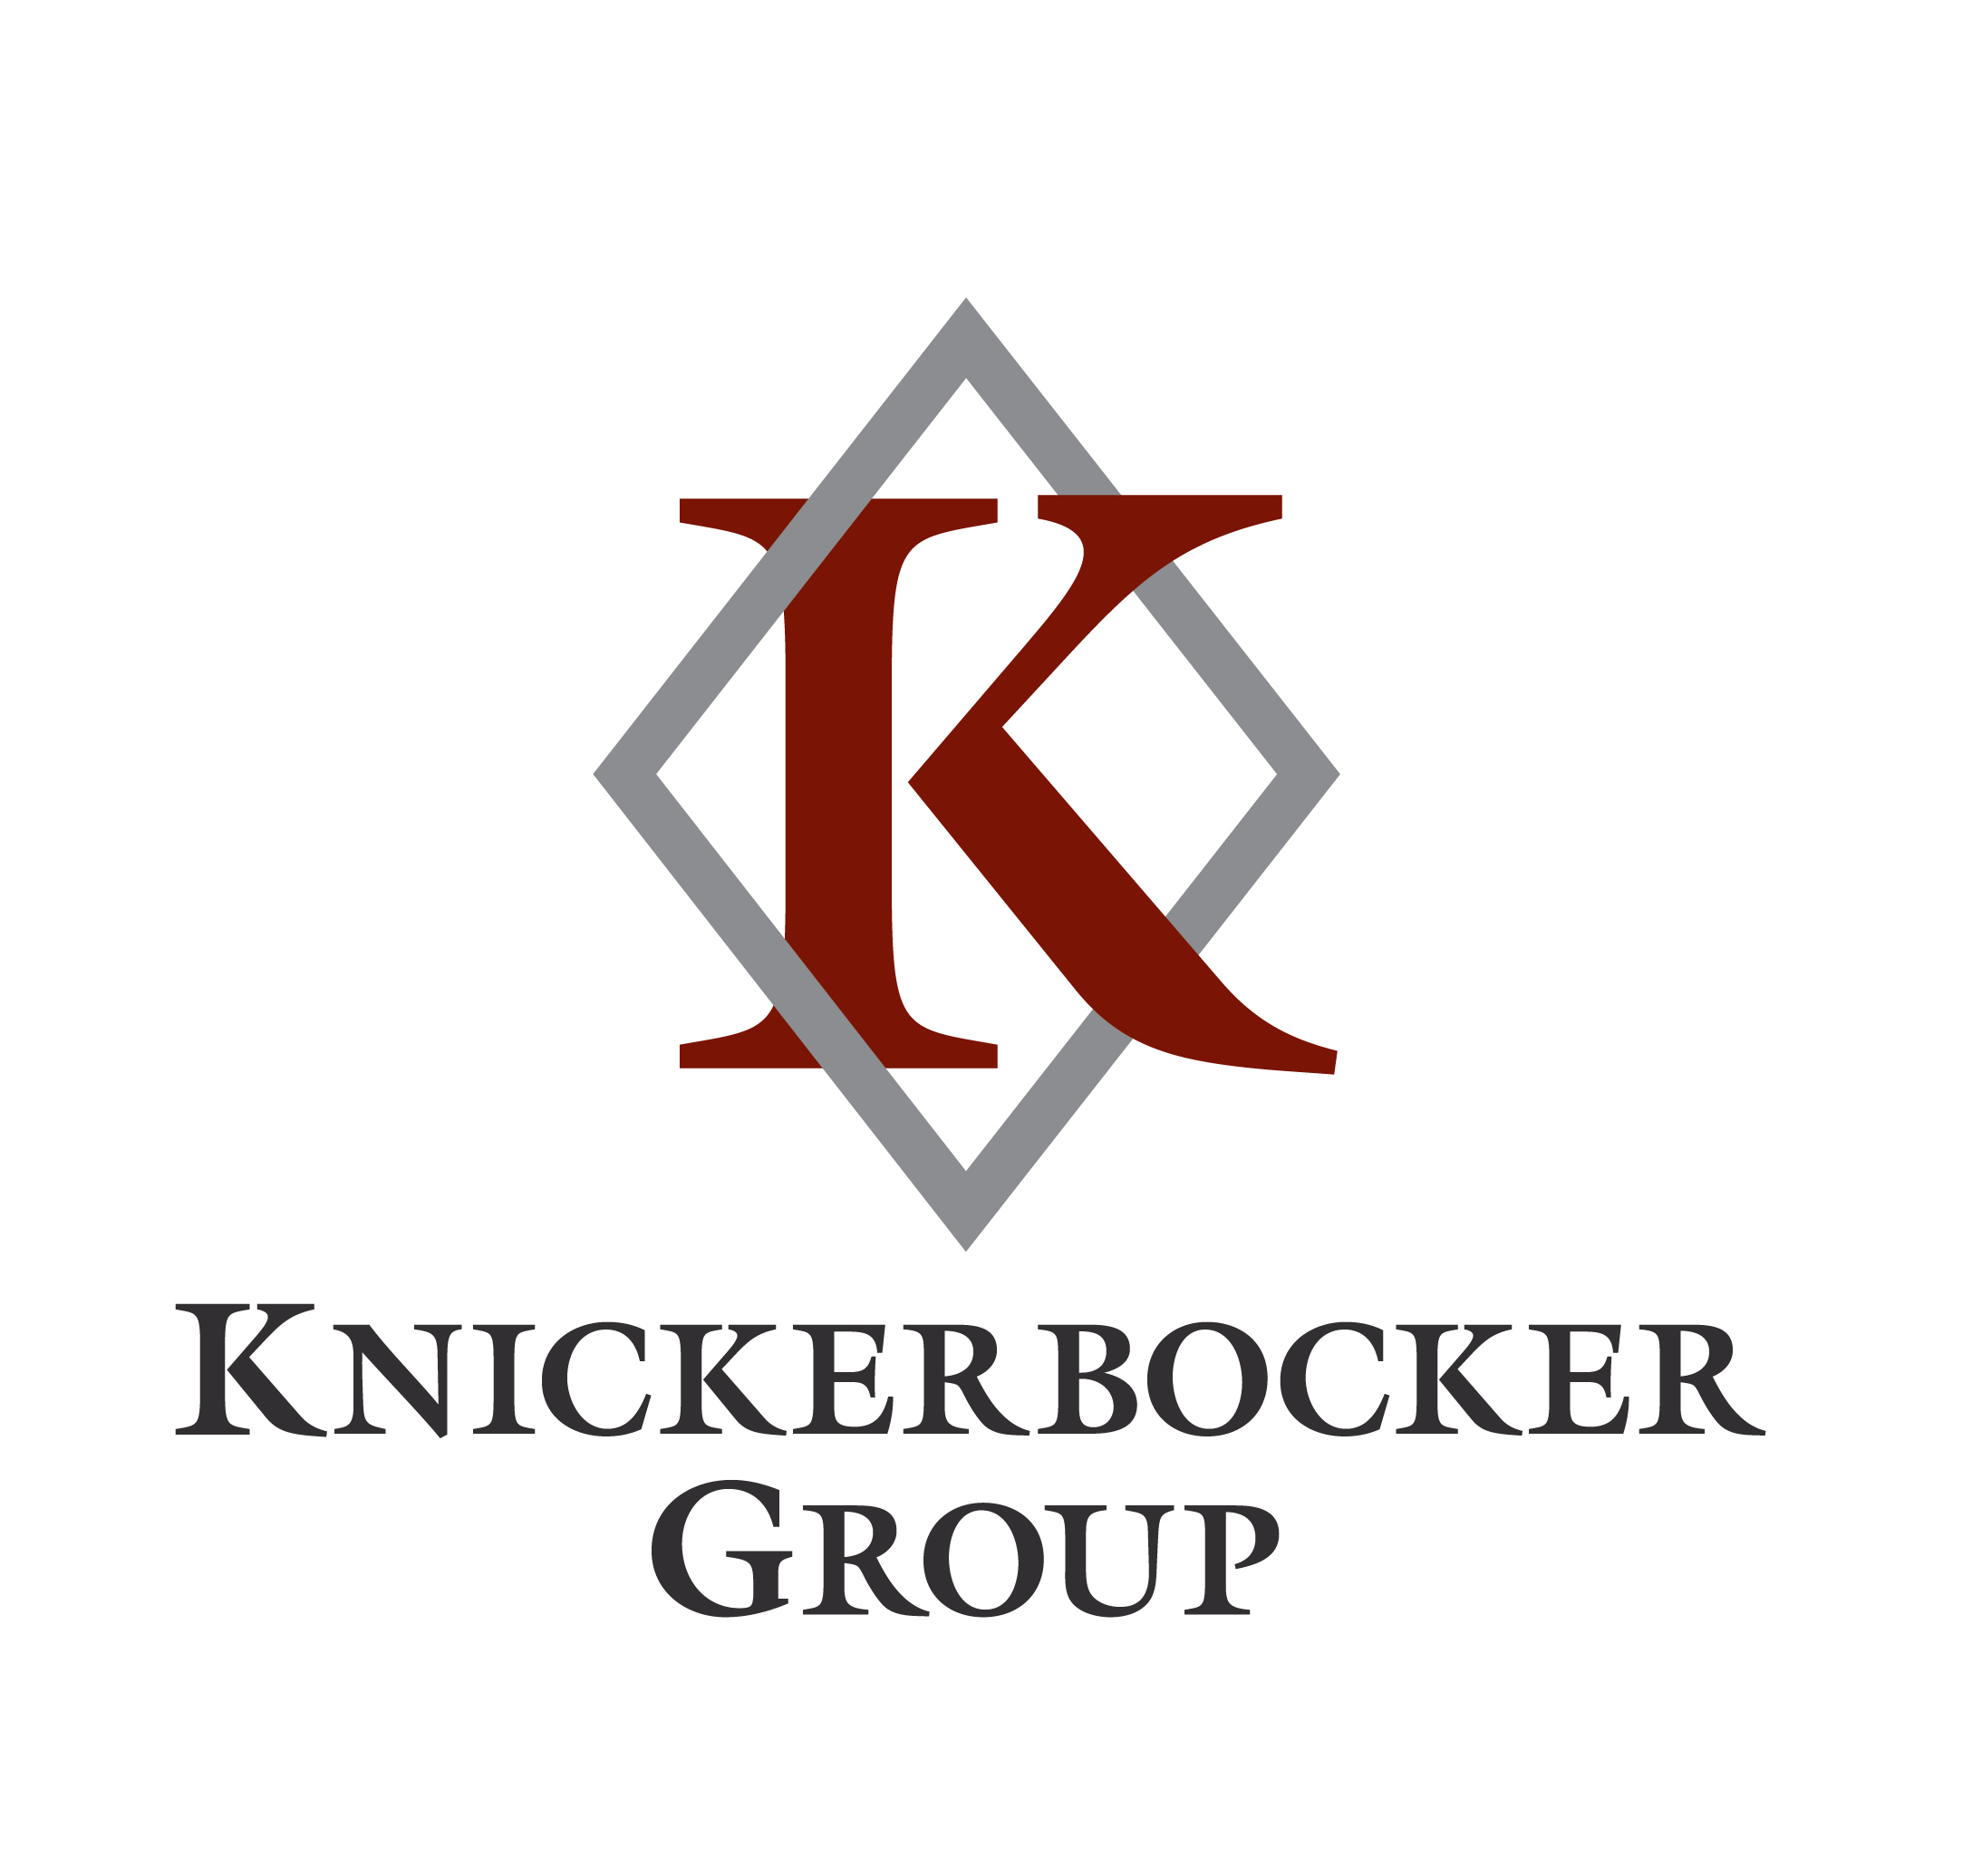 Knickerbocker Group Spring Conf 2021